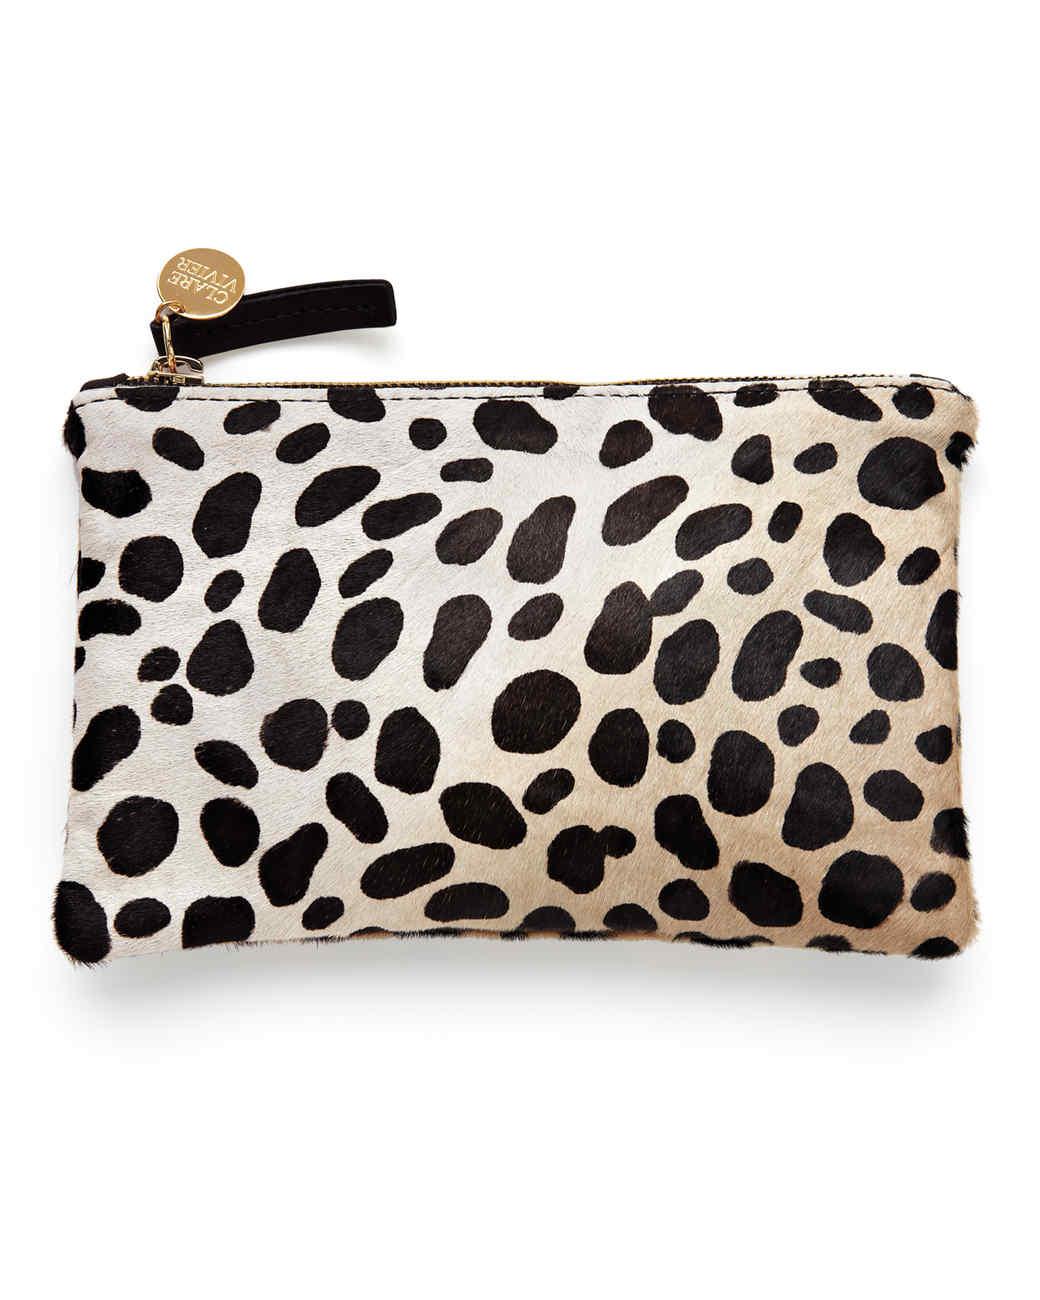 claire-vivier-leopard-wallet-008-mld109147.jpg